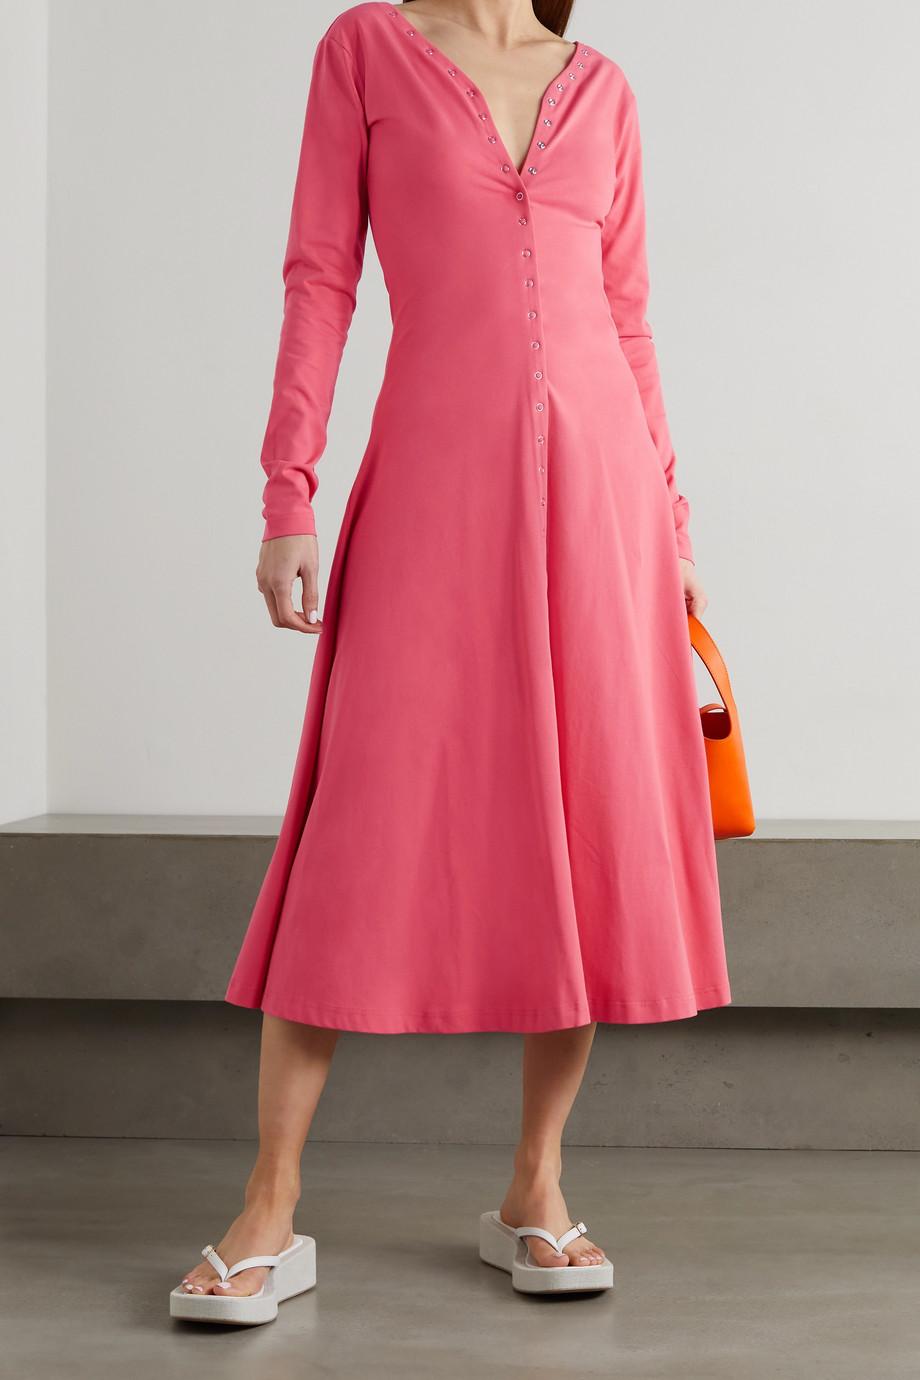 Molly Goddard Roberta stretch-cotton jersey midi dress